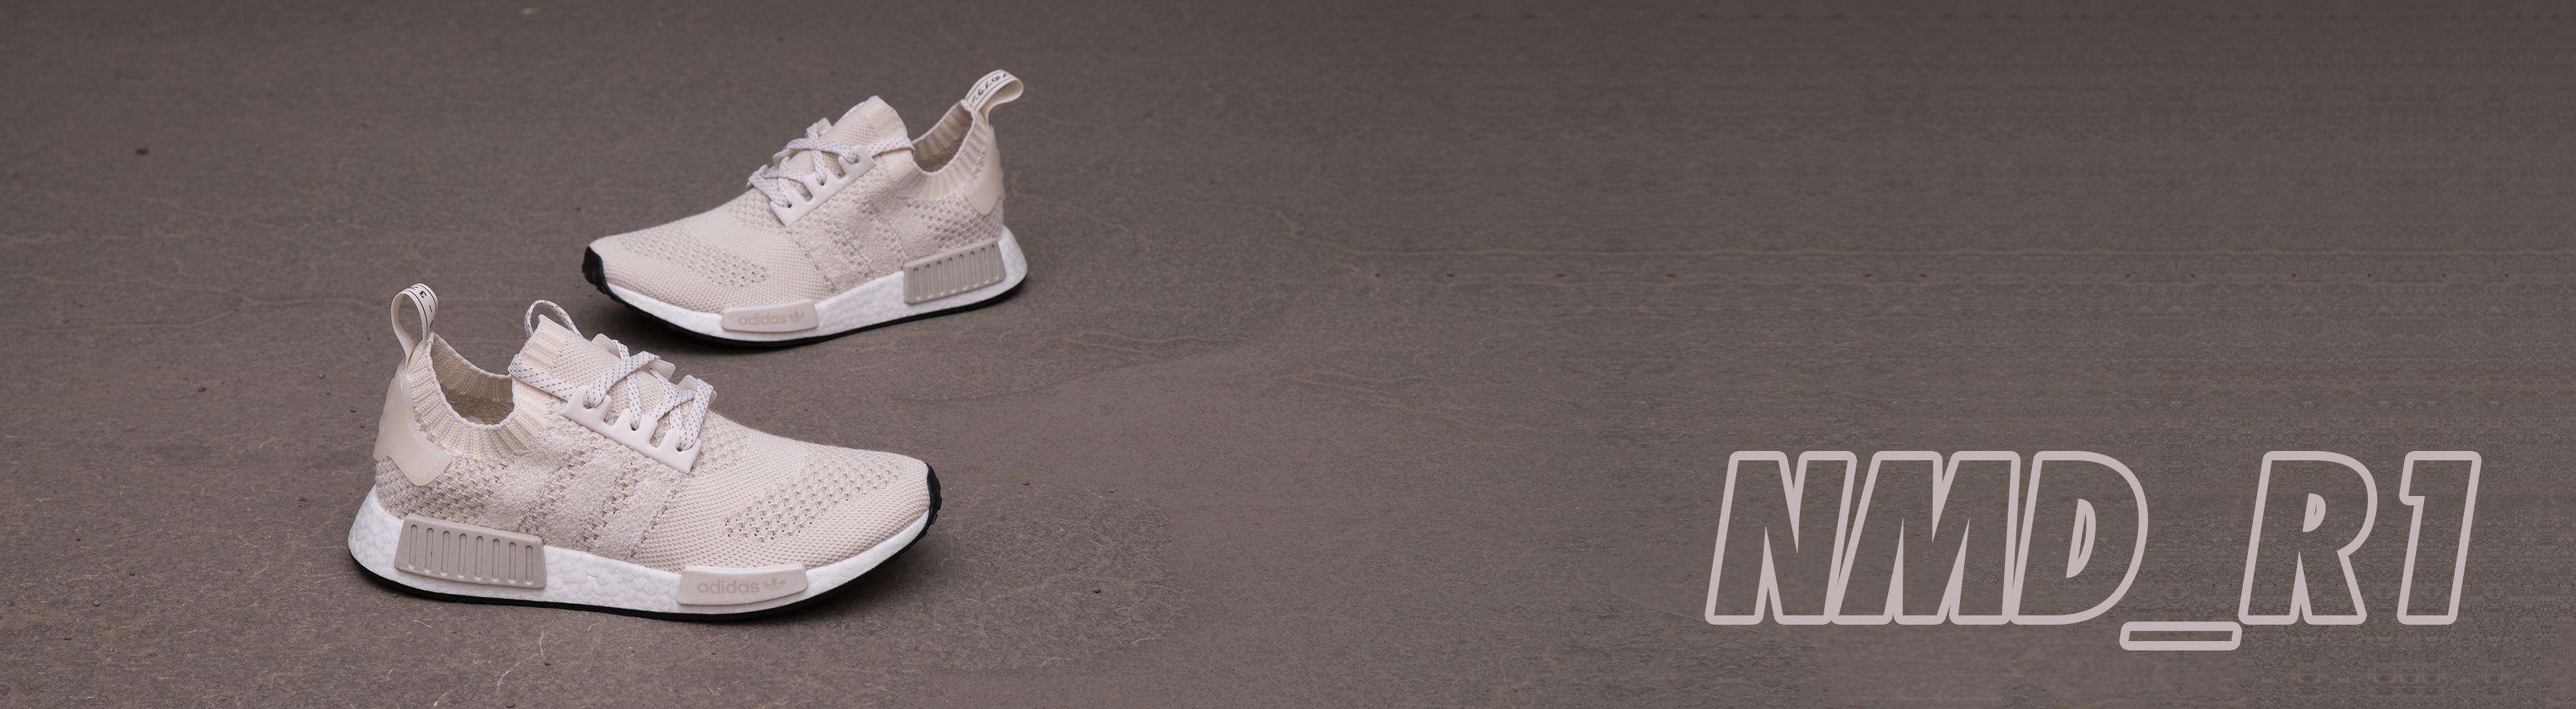 sale retailer 9ea25 3acc1 Footish - Om du gillar sneakers - Nike-Adidas-Reebok-Puma